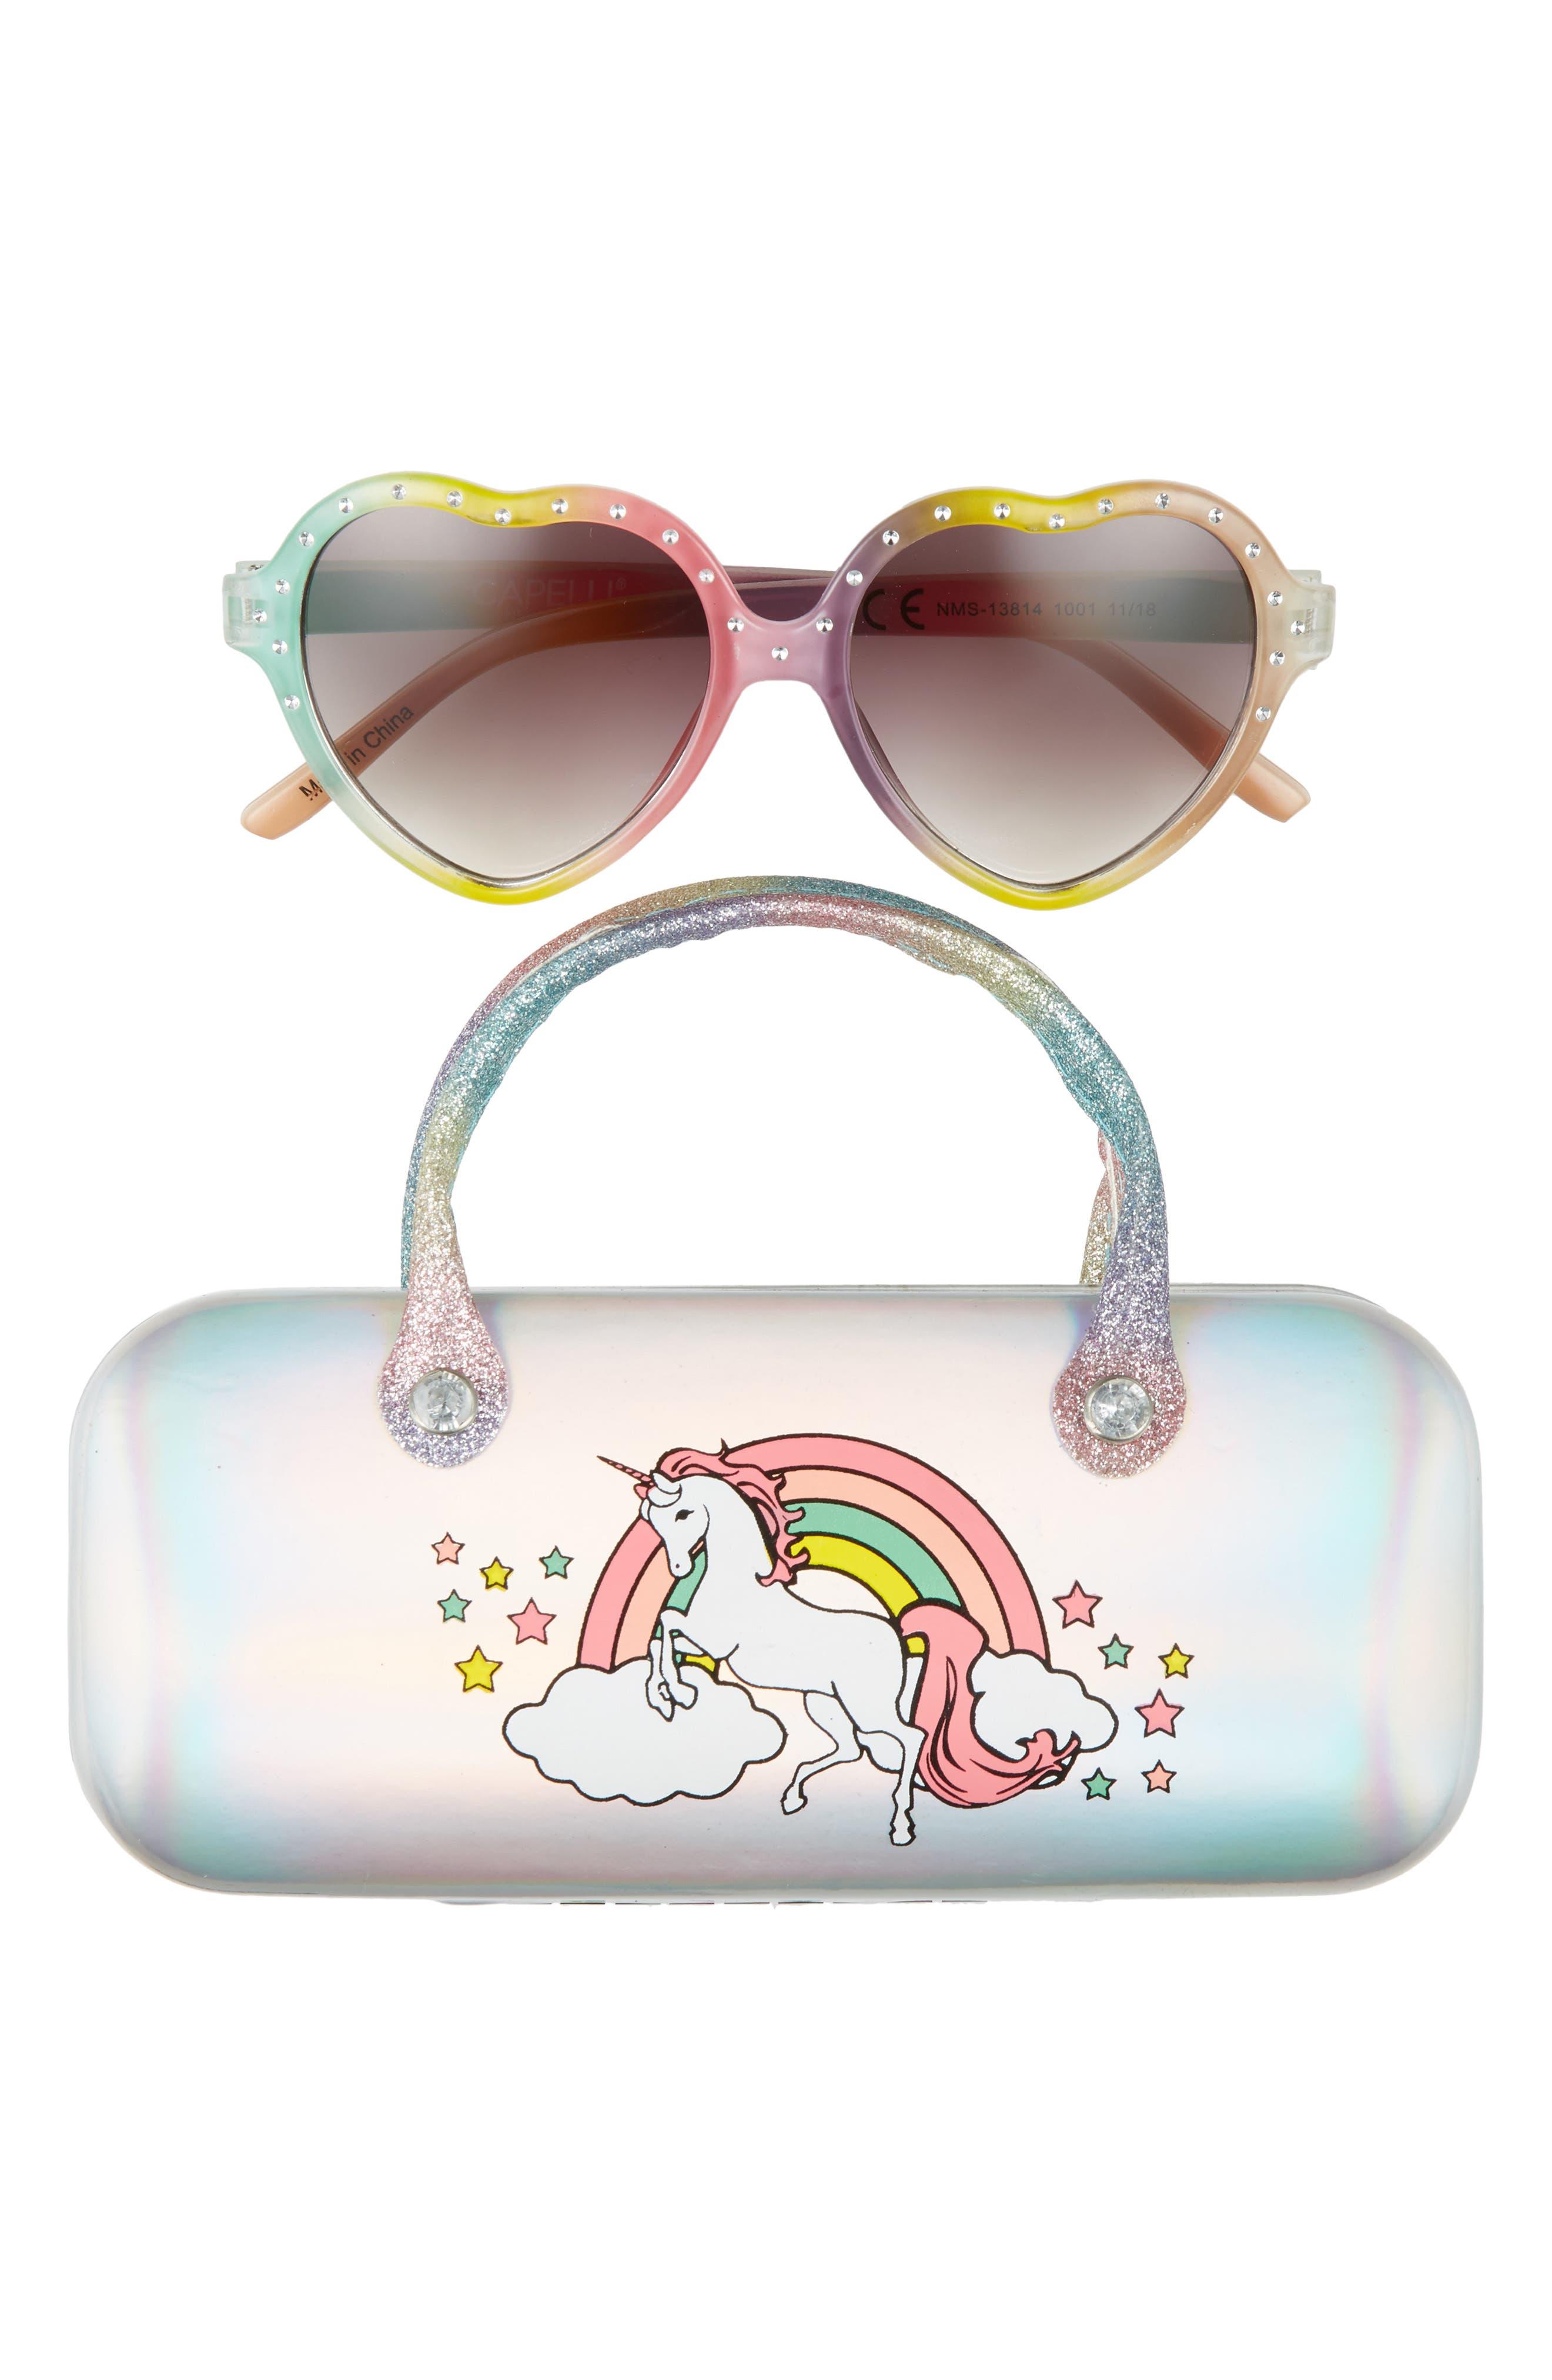 CAPELLI NEW YORK,                             49mm Heart Sunglasses & Metallic Case Set,                             Main thumbnail 1, color,                             MULTI COMBO